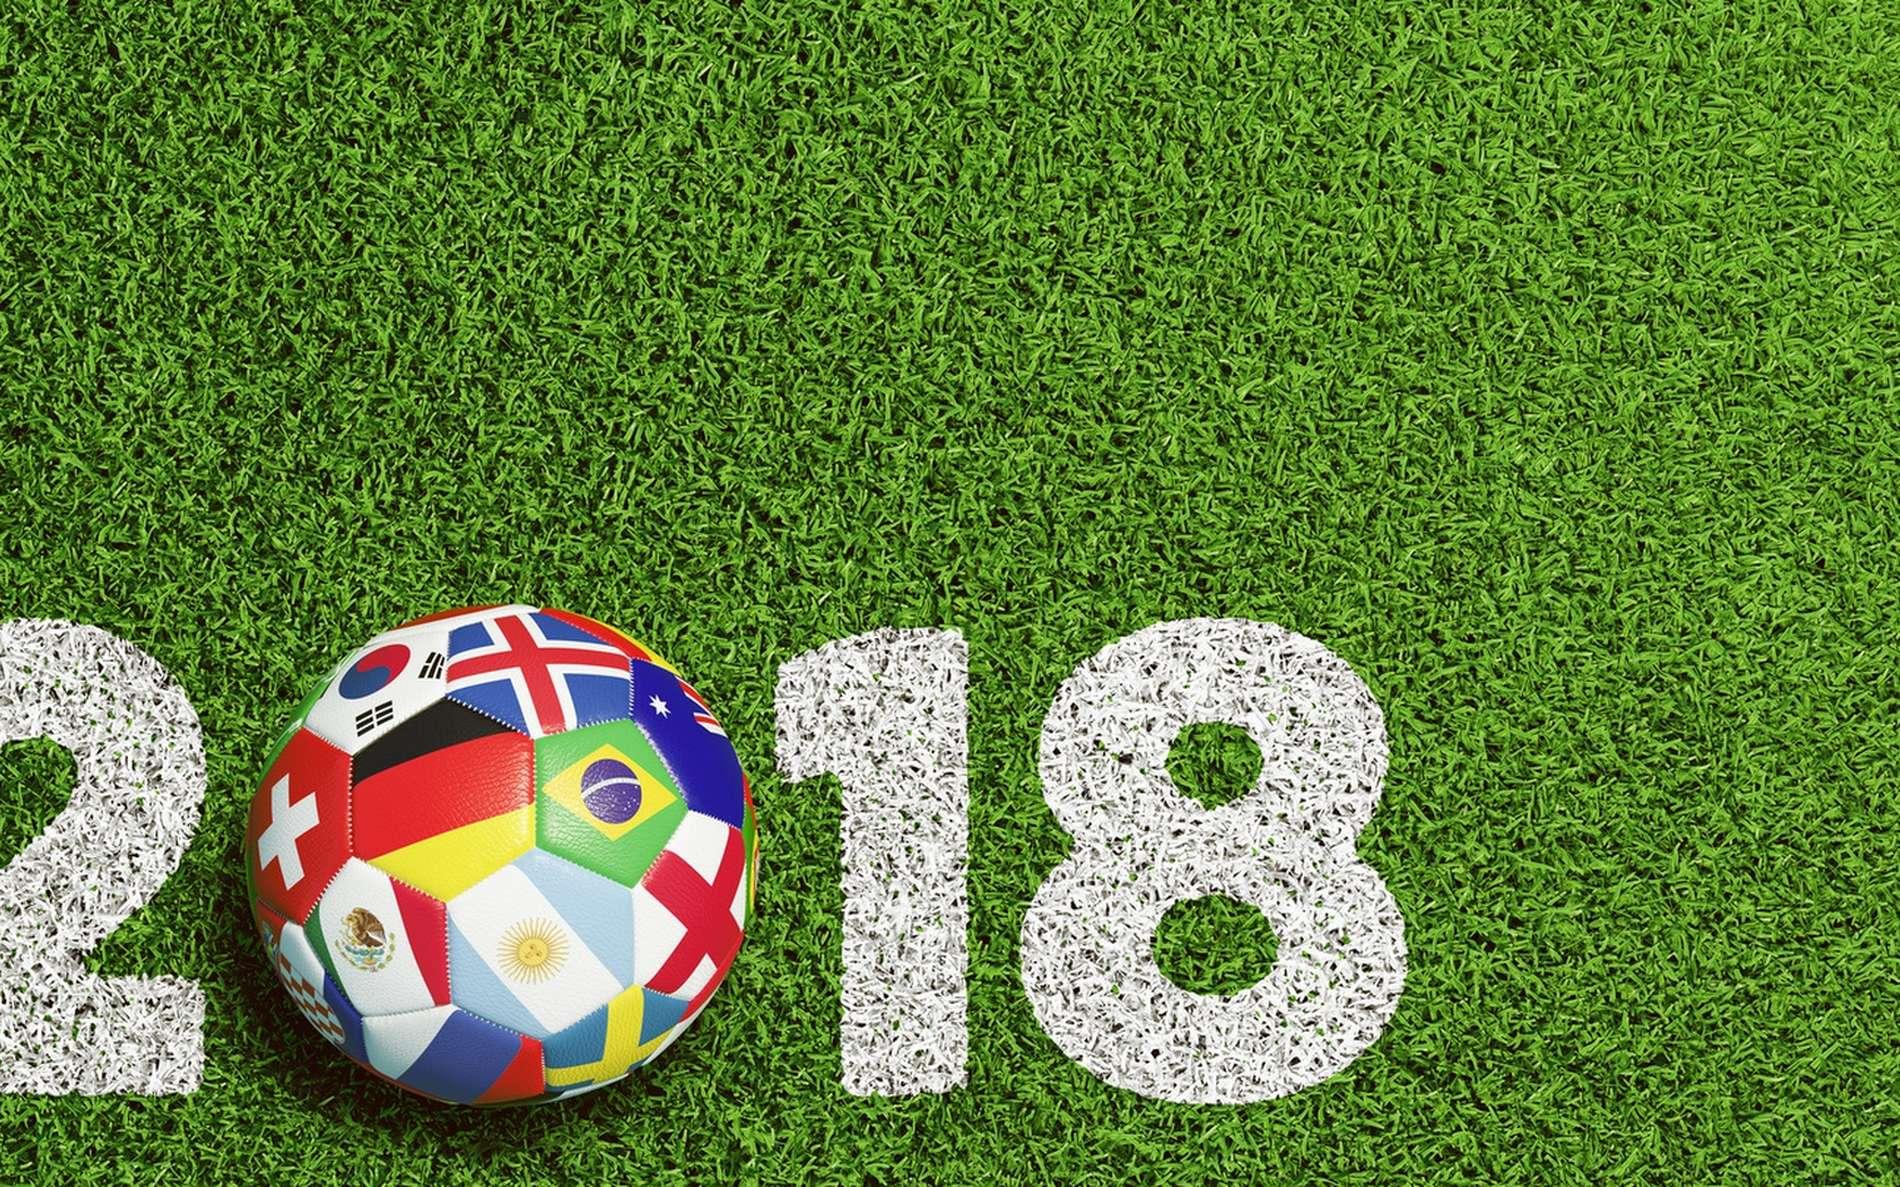 La Coupe du monde de football 2018 en Russie. © Robert Kneschke, Fotolia